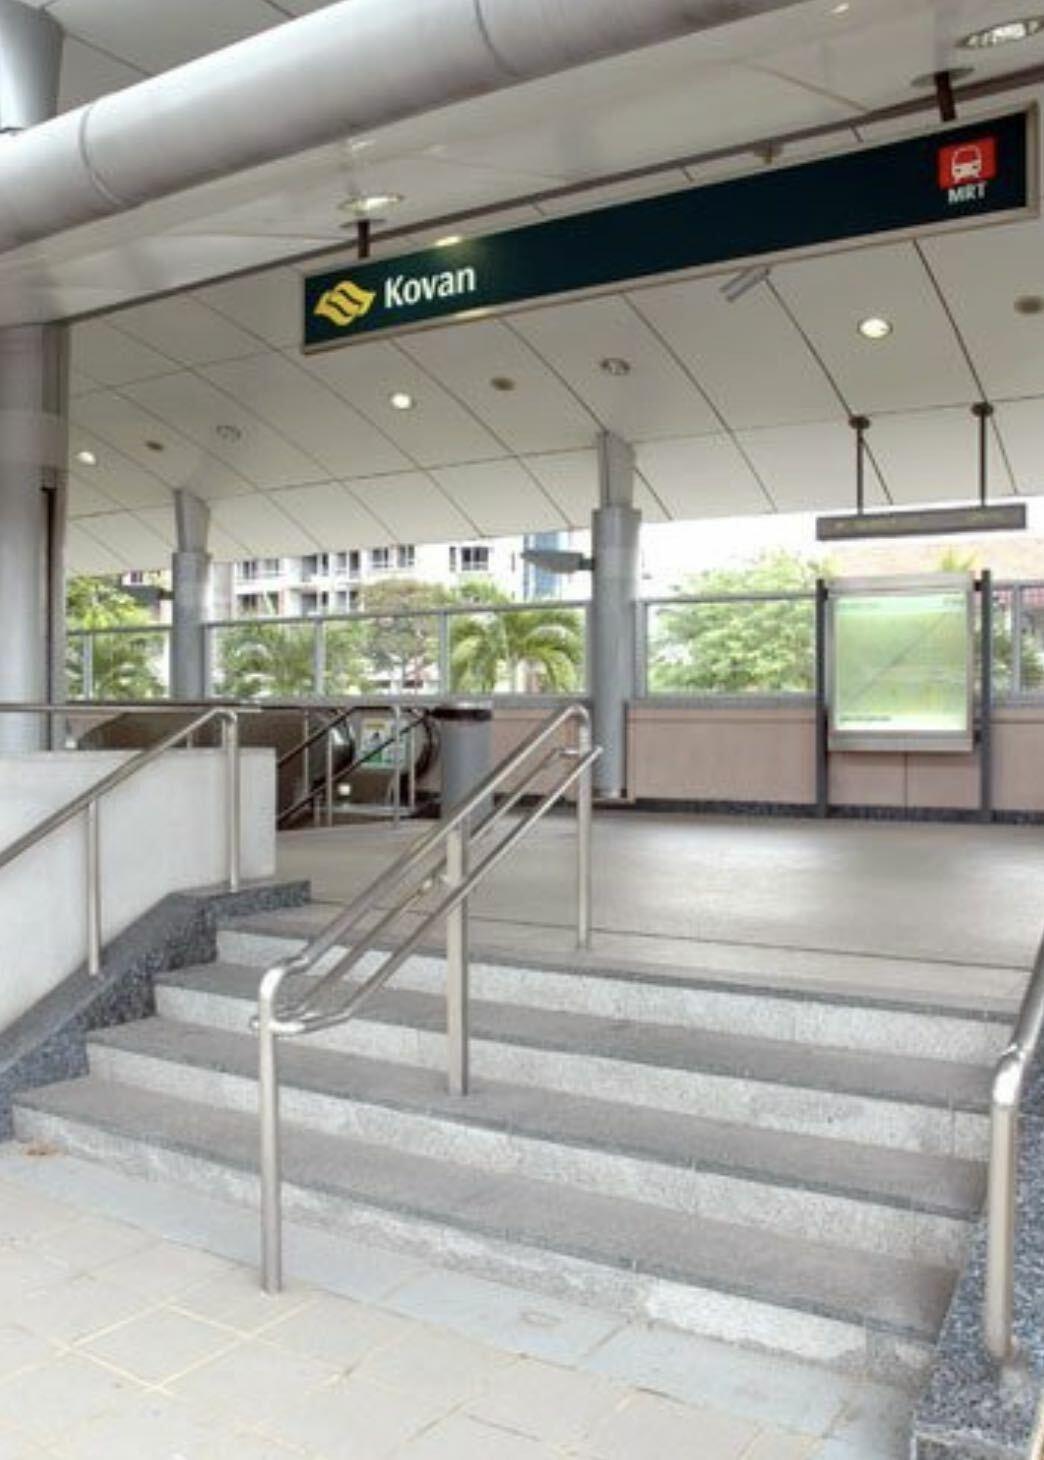 SHORT WALK TO KOVAN MRT, 2STY SEMI-D!! #128934429